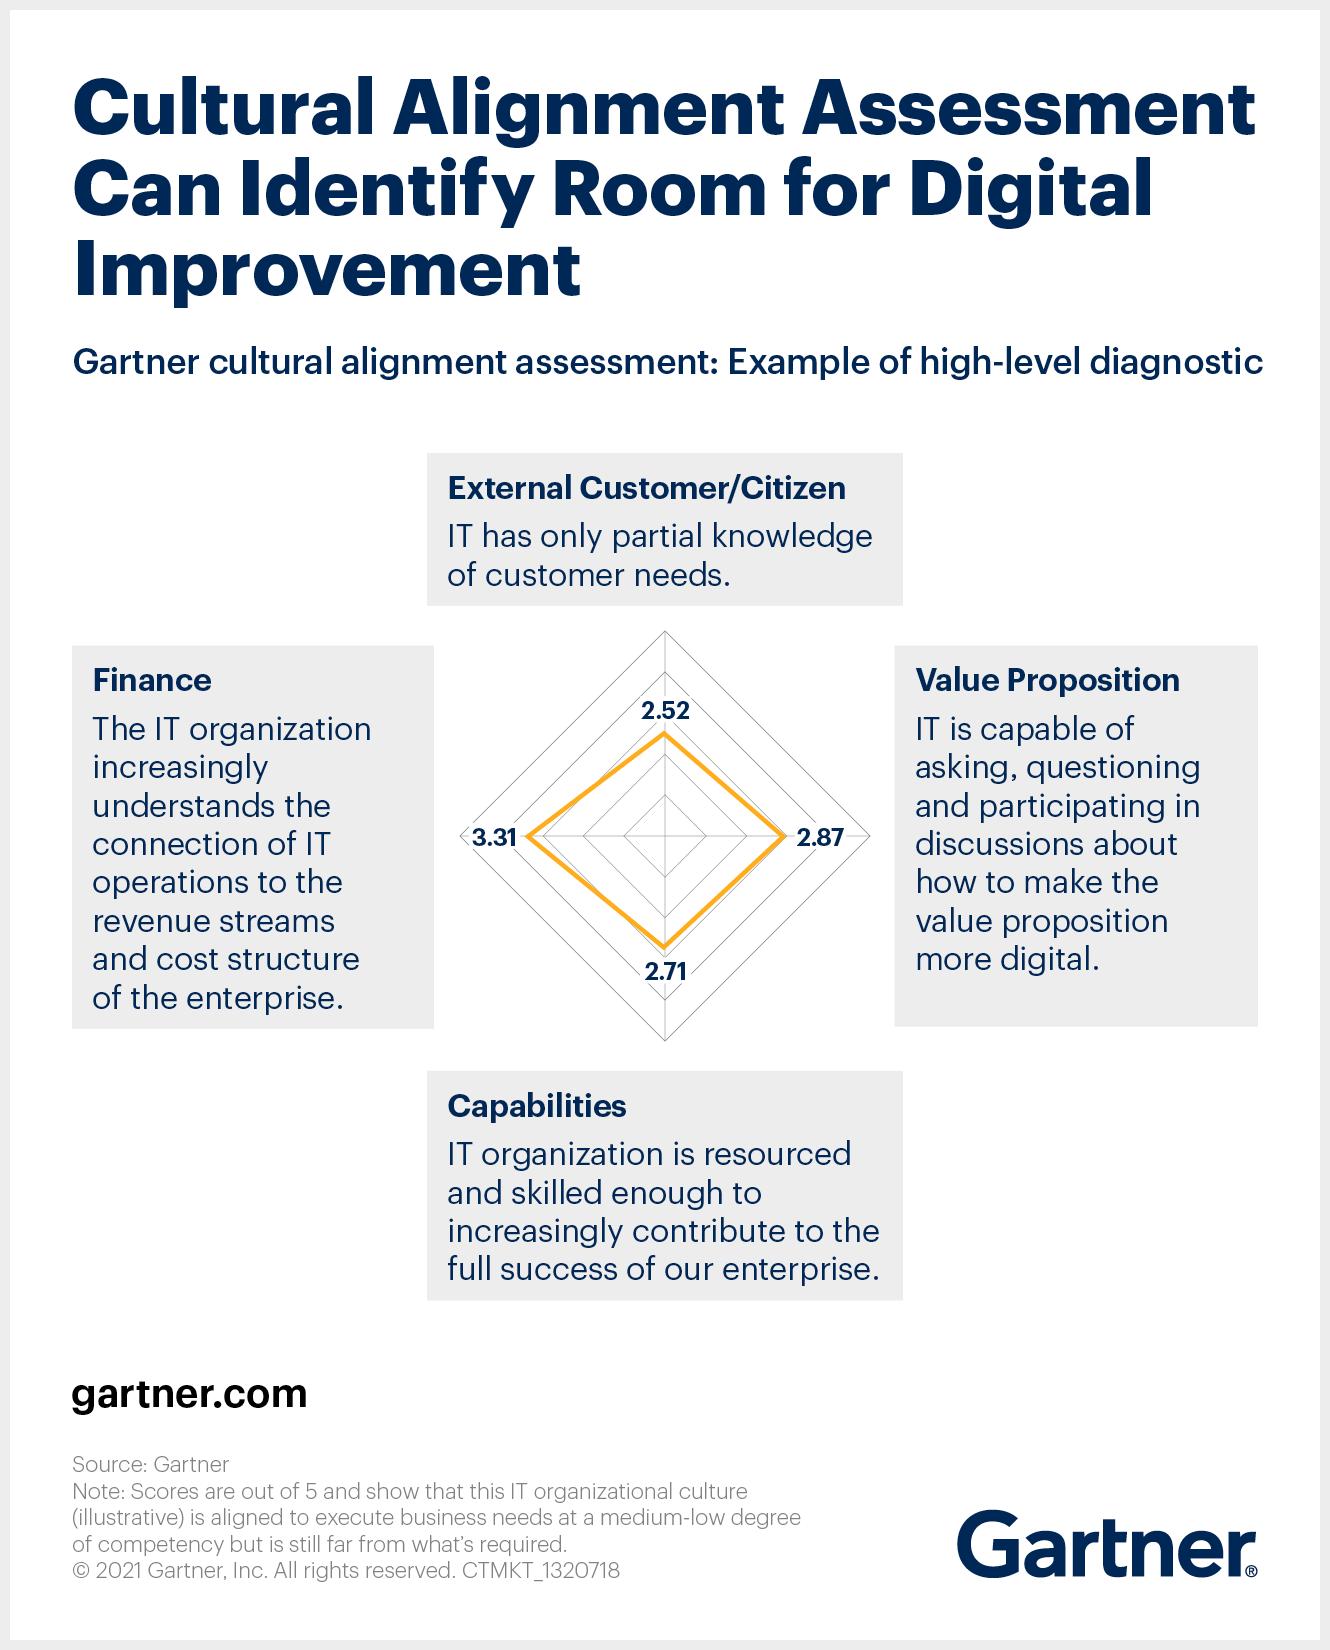 Cultural Alignment Assessment for Digital Improvement